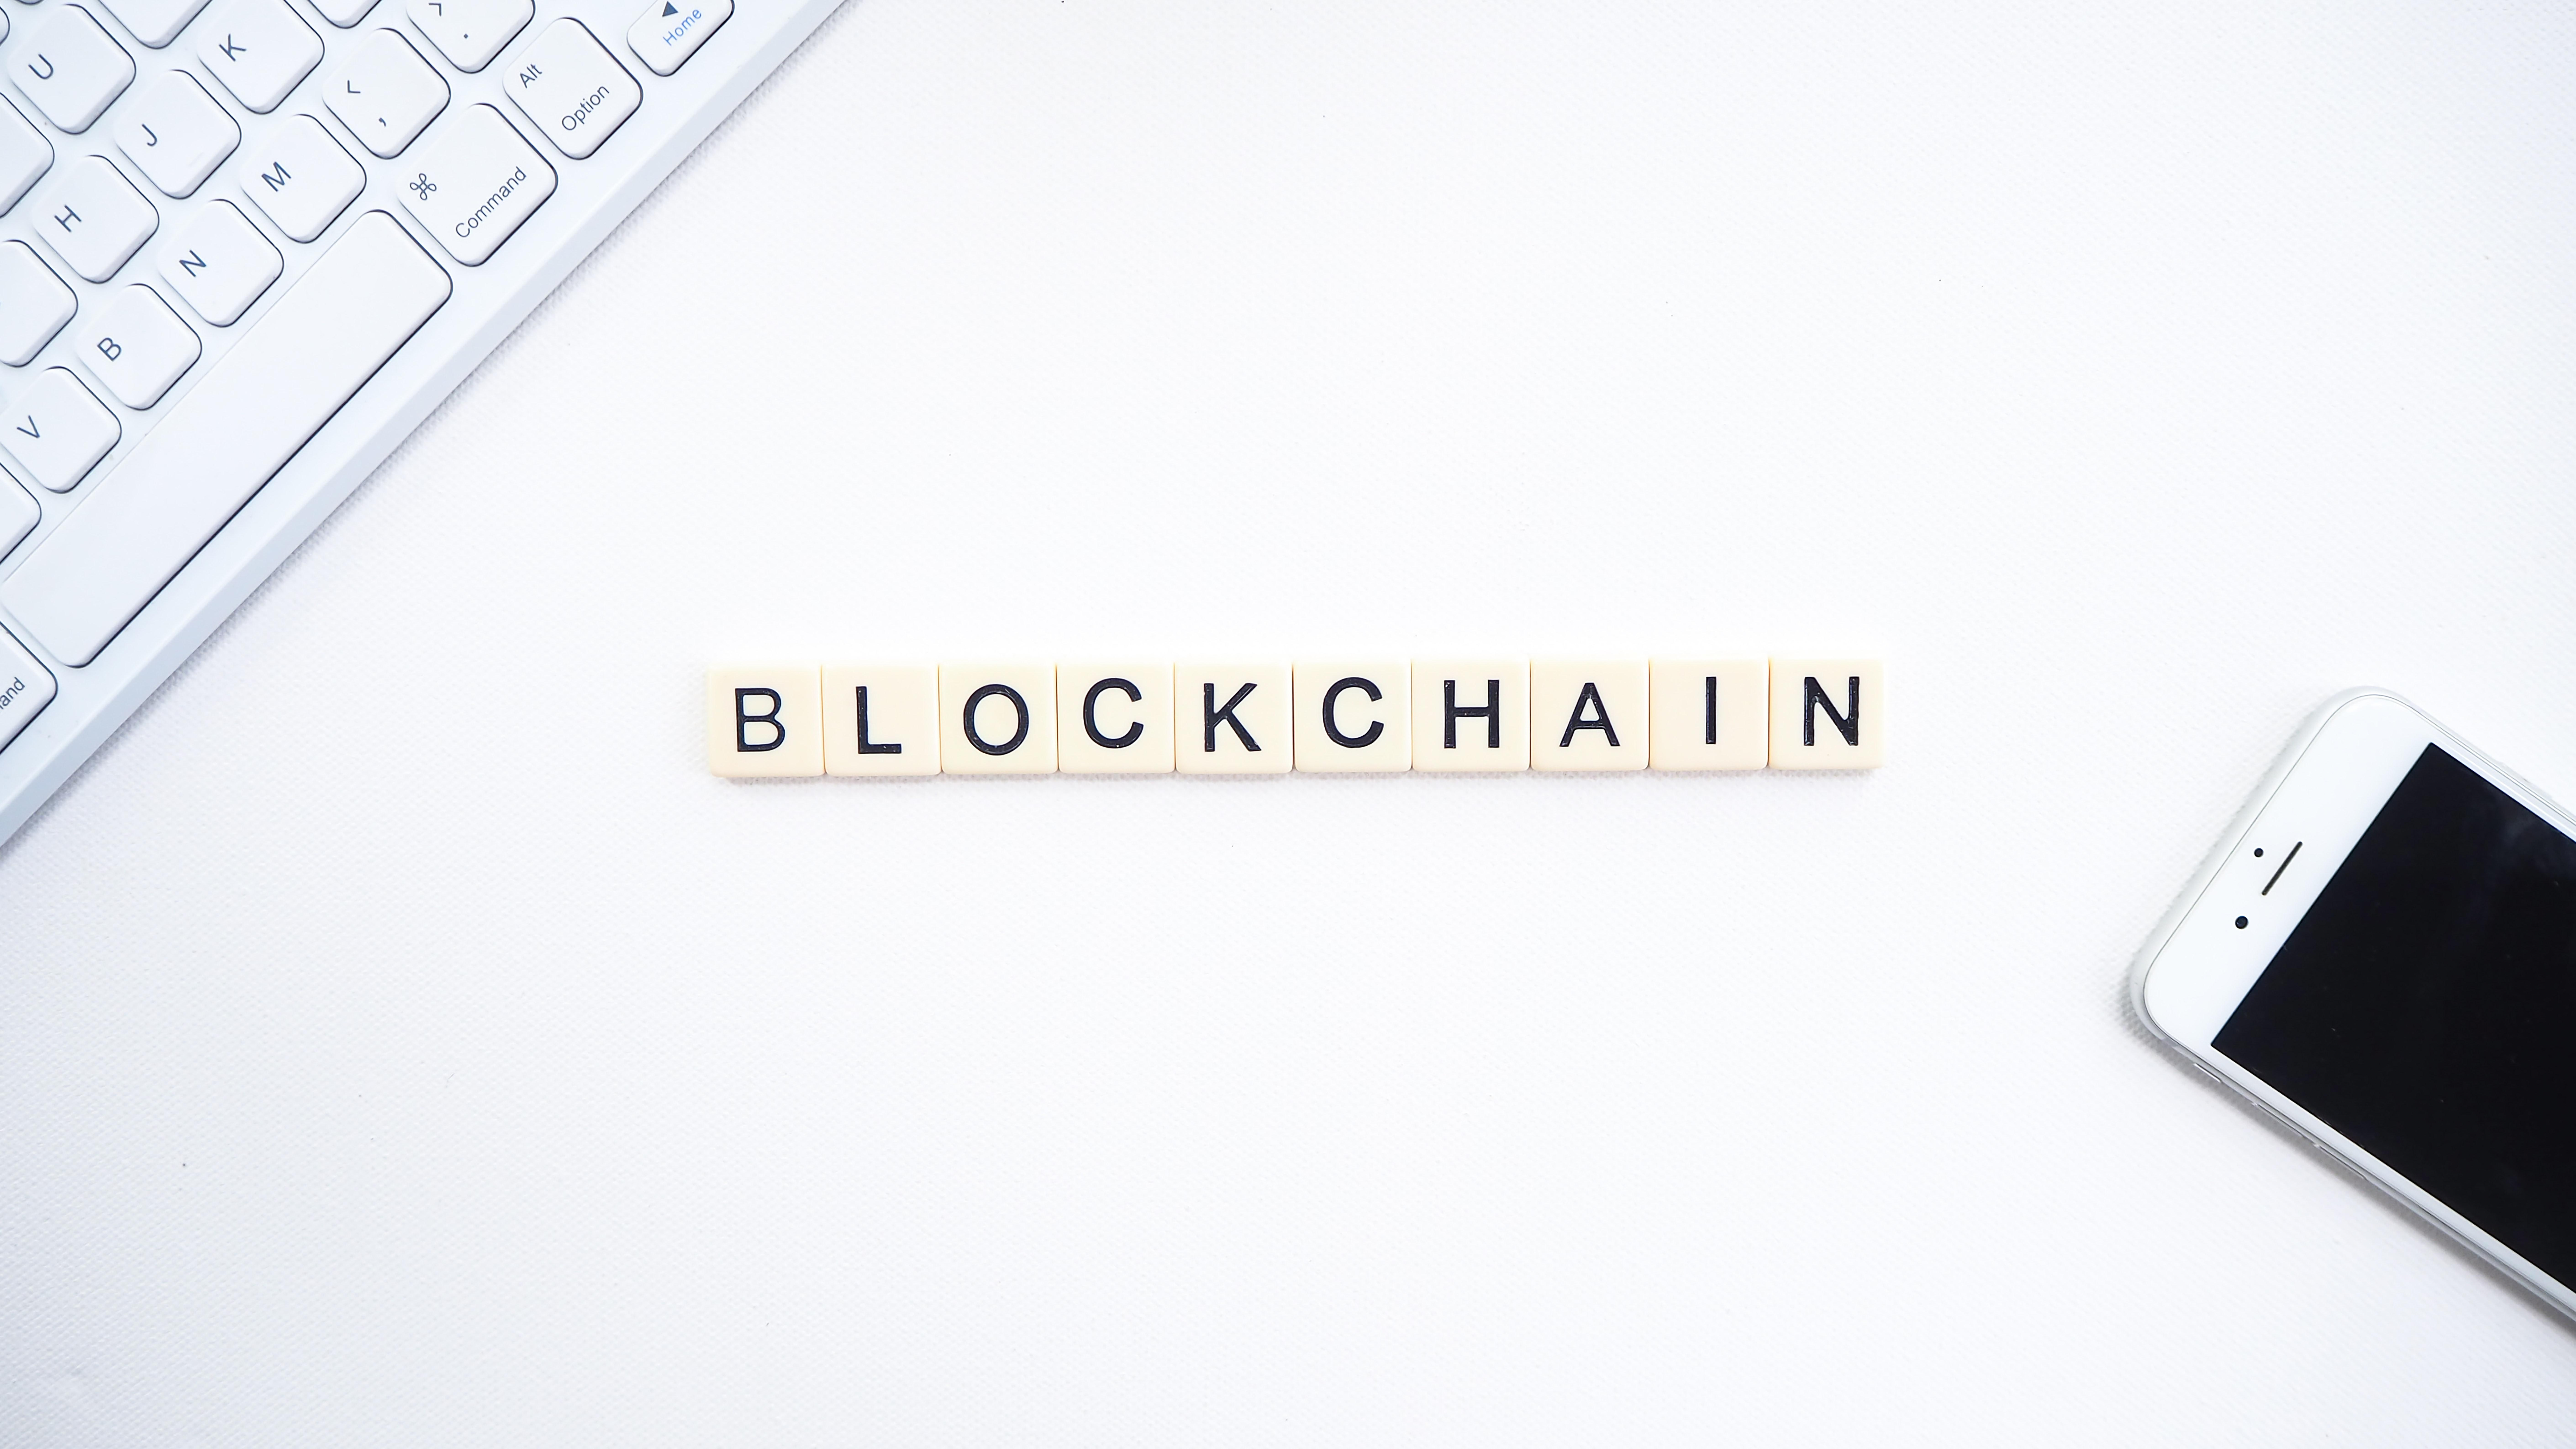 Blockchain St Pete Tampa Bay